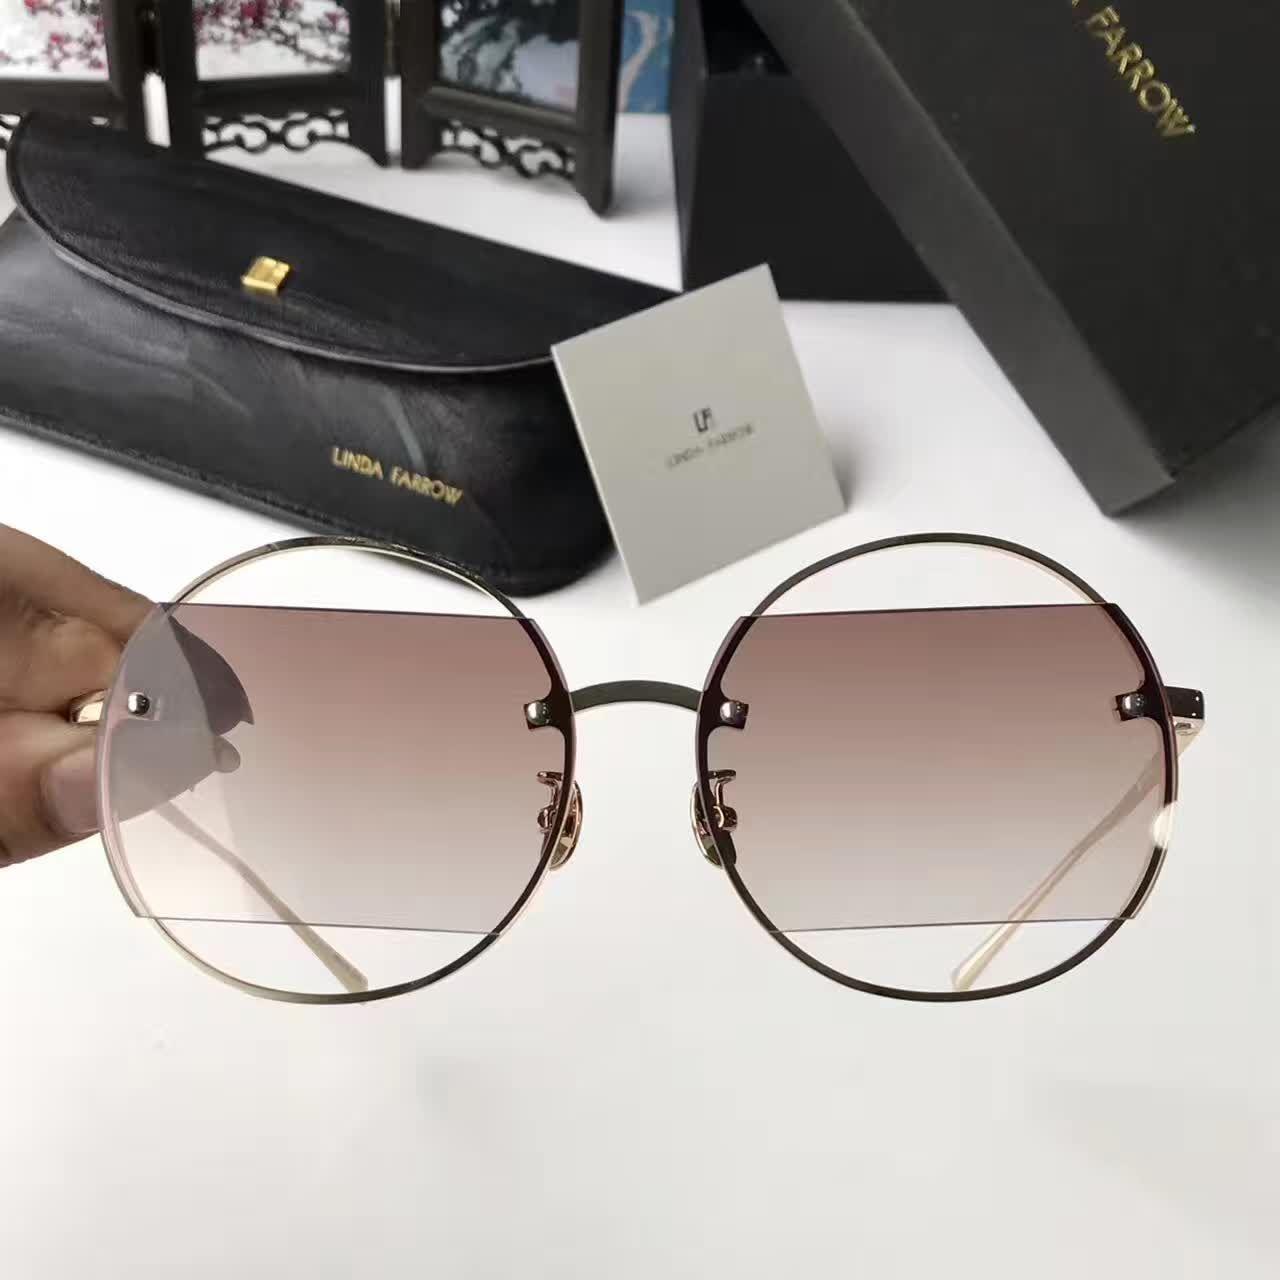 a69bafb1ff60 2017 Linda Farrow LFL426 Round Sunglasses Gold brown Shaded Women ...